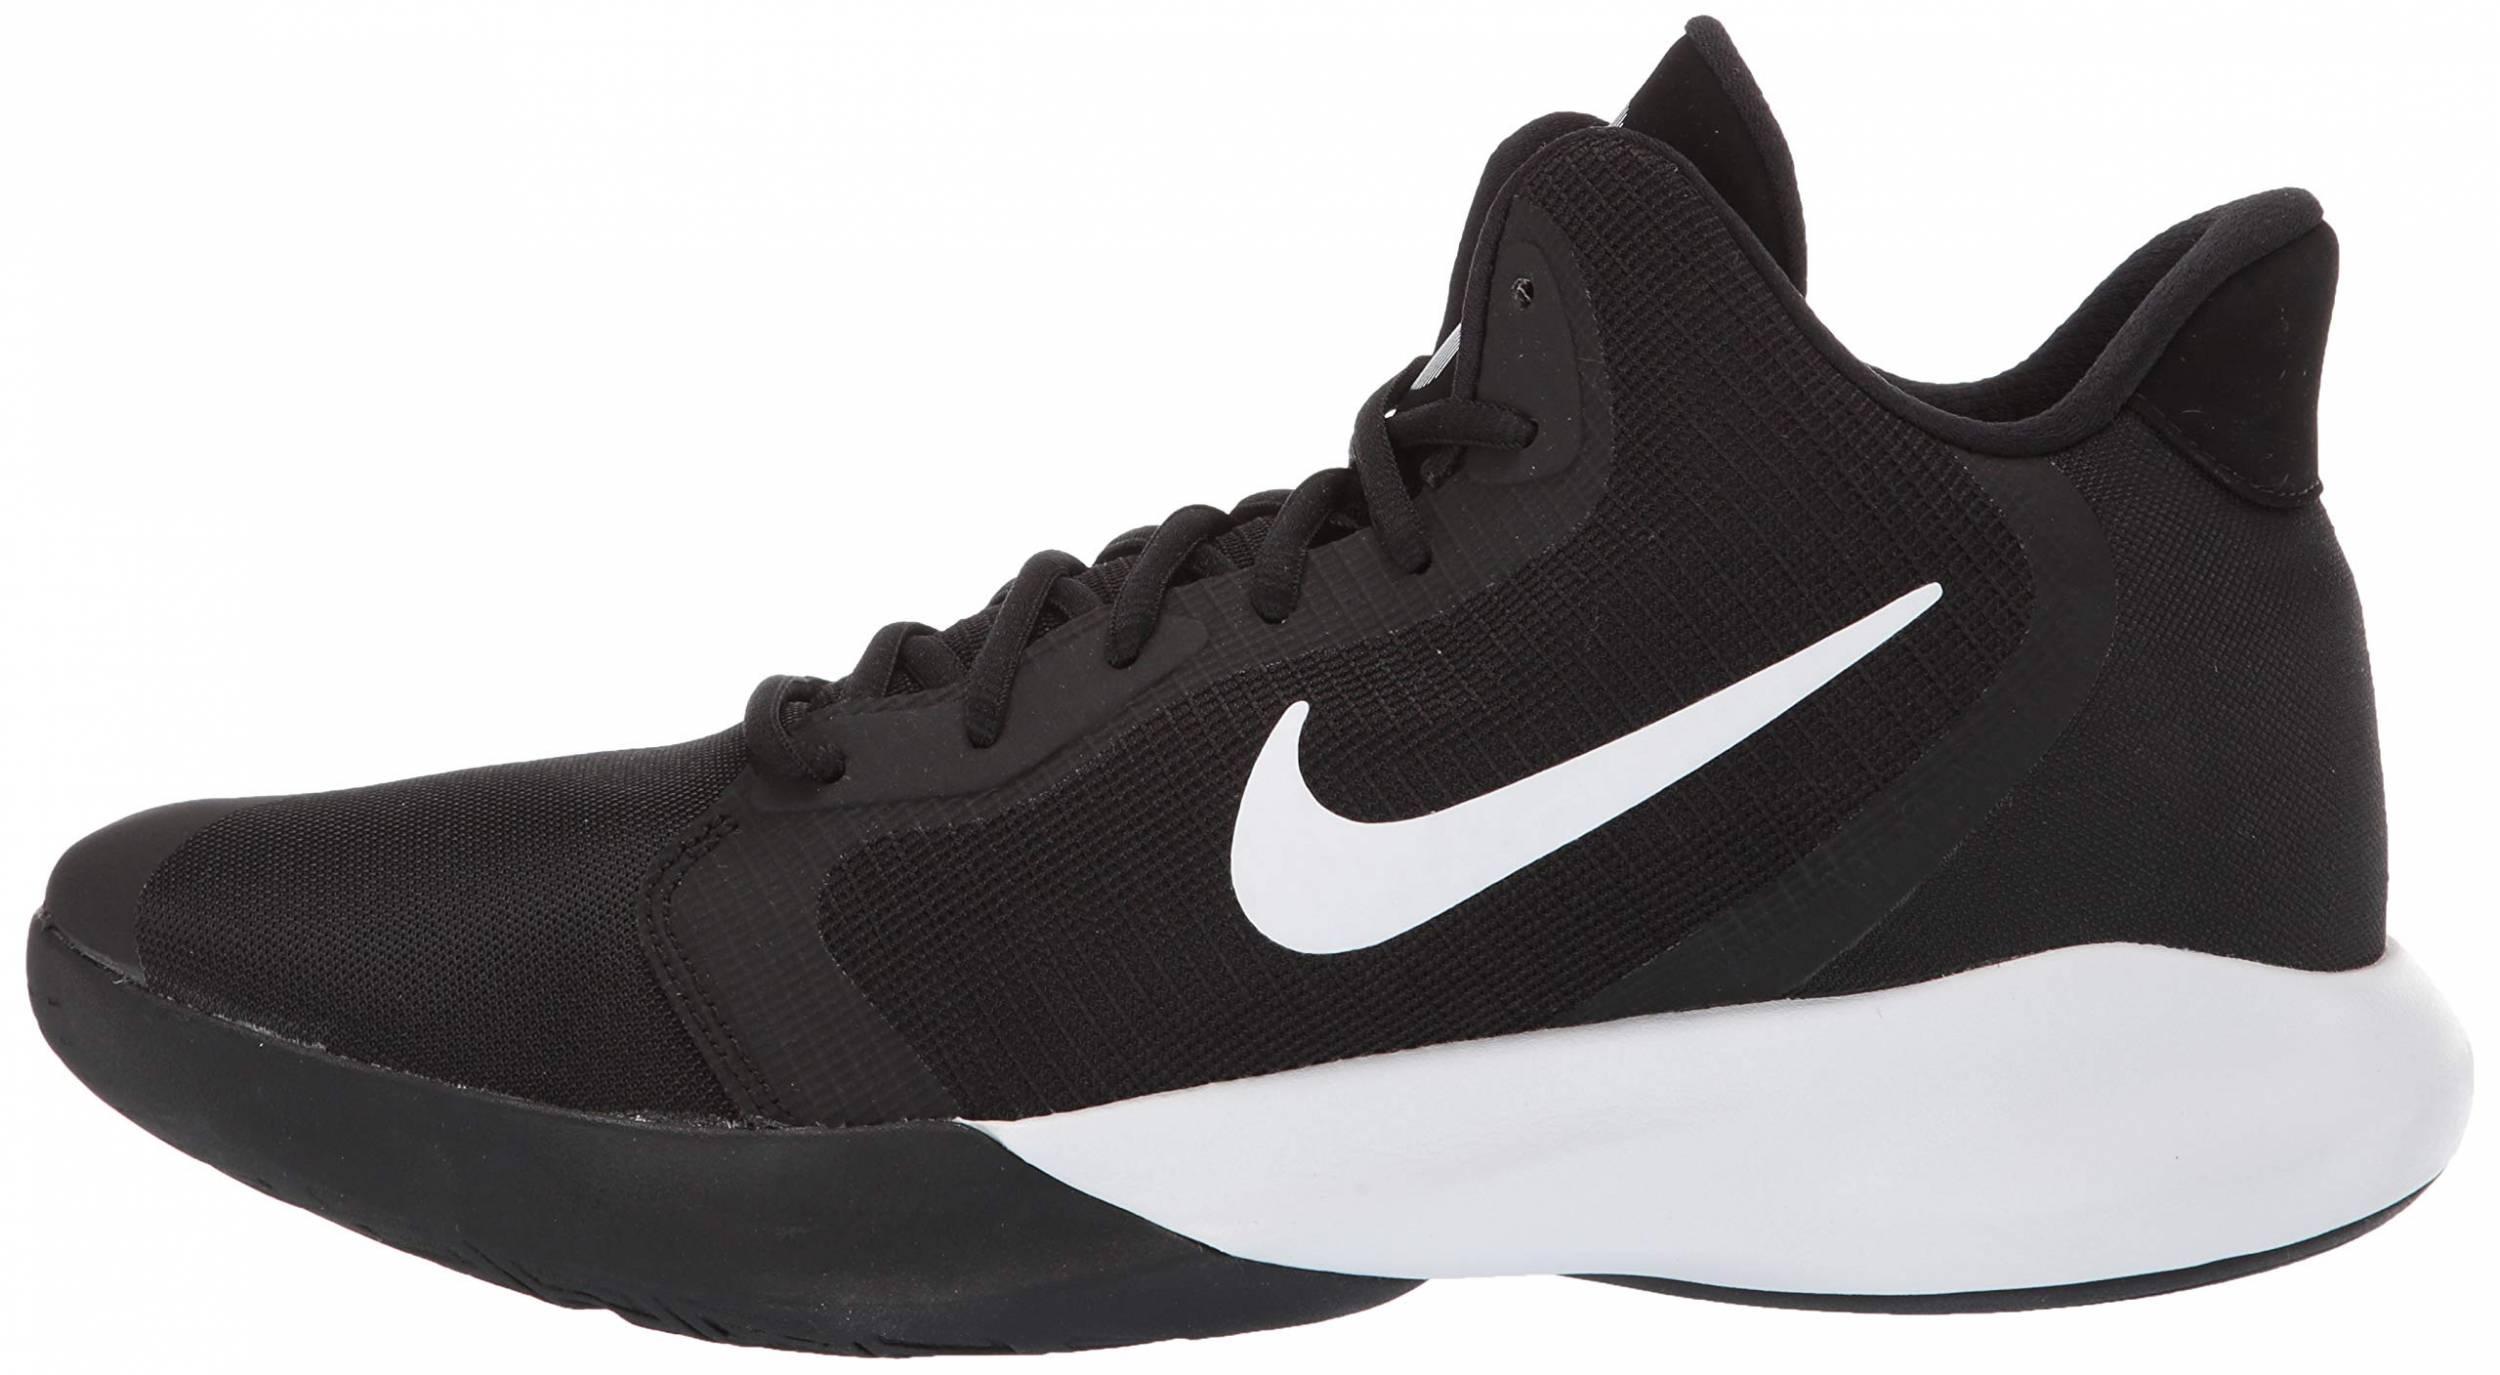 Centrar Escribe email Rico  Nike Precision 3 - Deals ($50), Facts, Reviews (2021)   RunRepeat